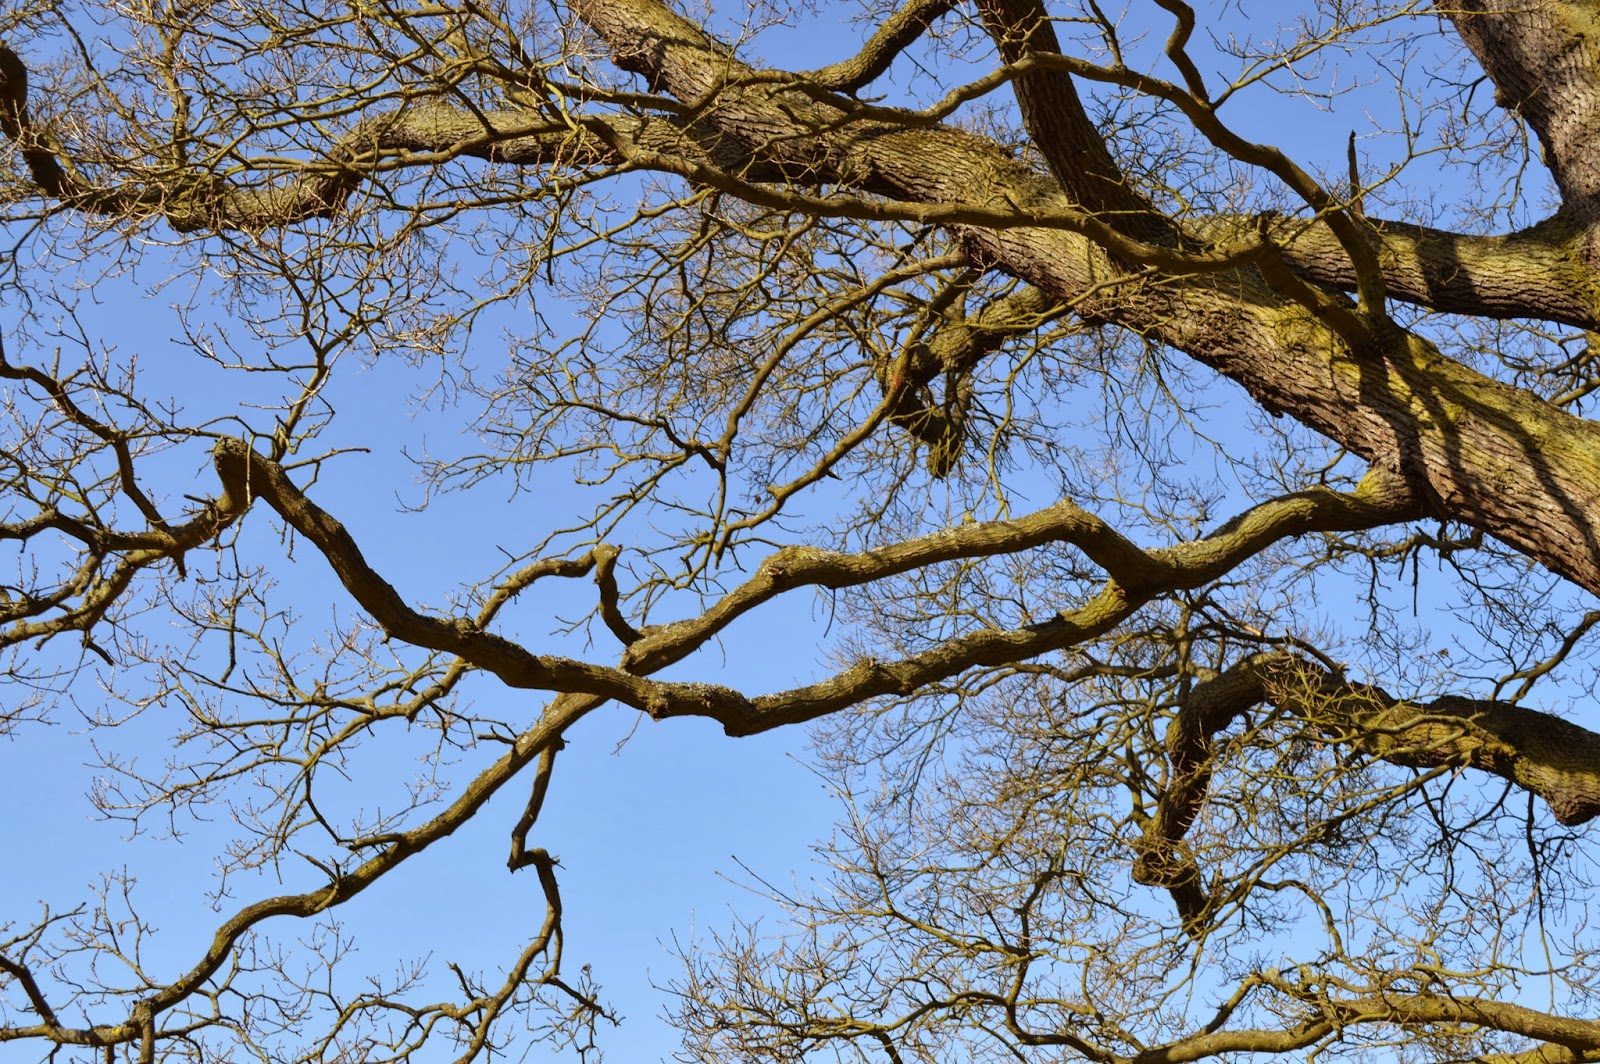 Essex, Chelmsford, local, walk, park Hylands House, day out, dog walking, sunshine, building architecture, V festival, fields, flint cottage, tree, blue sky,